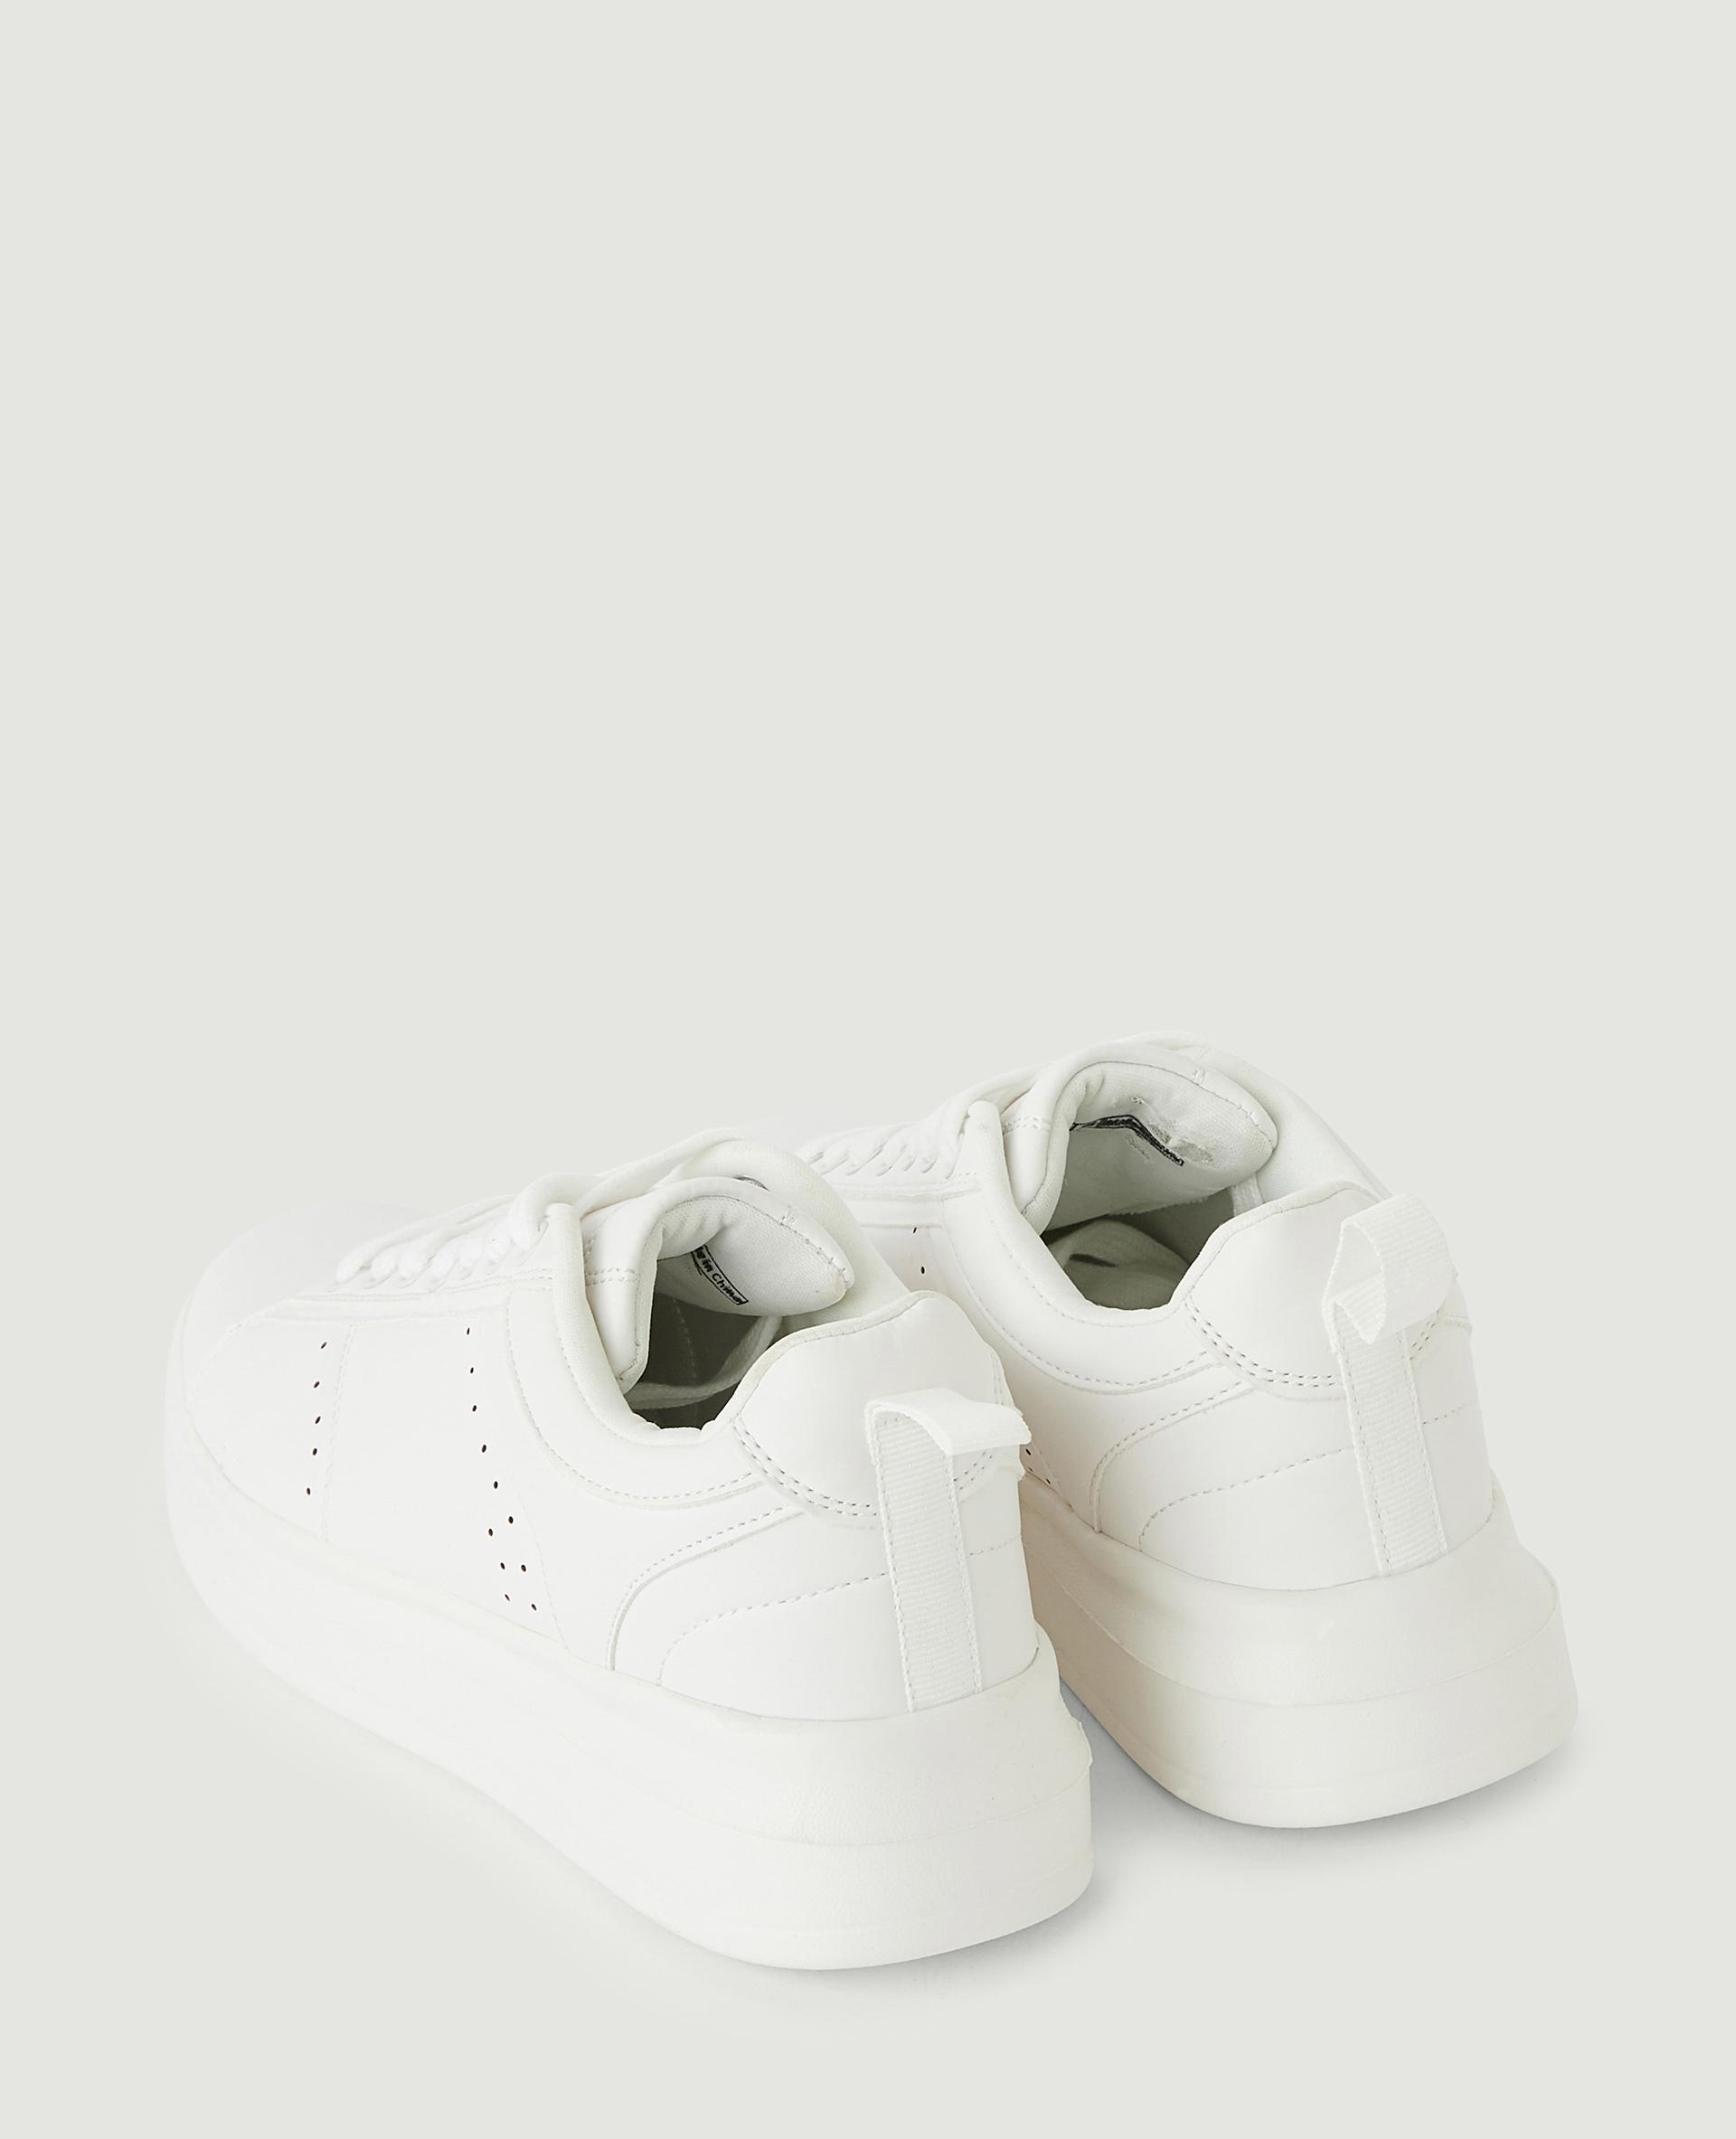 Baskets simili cuir à plateforme blanc - Pimkie